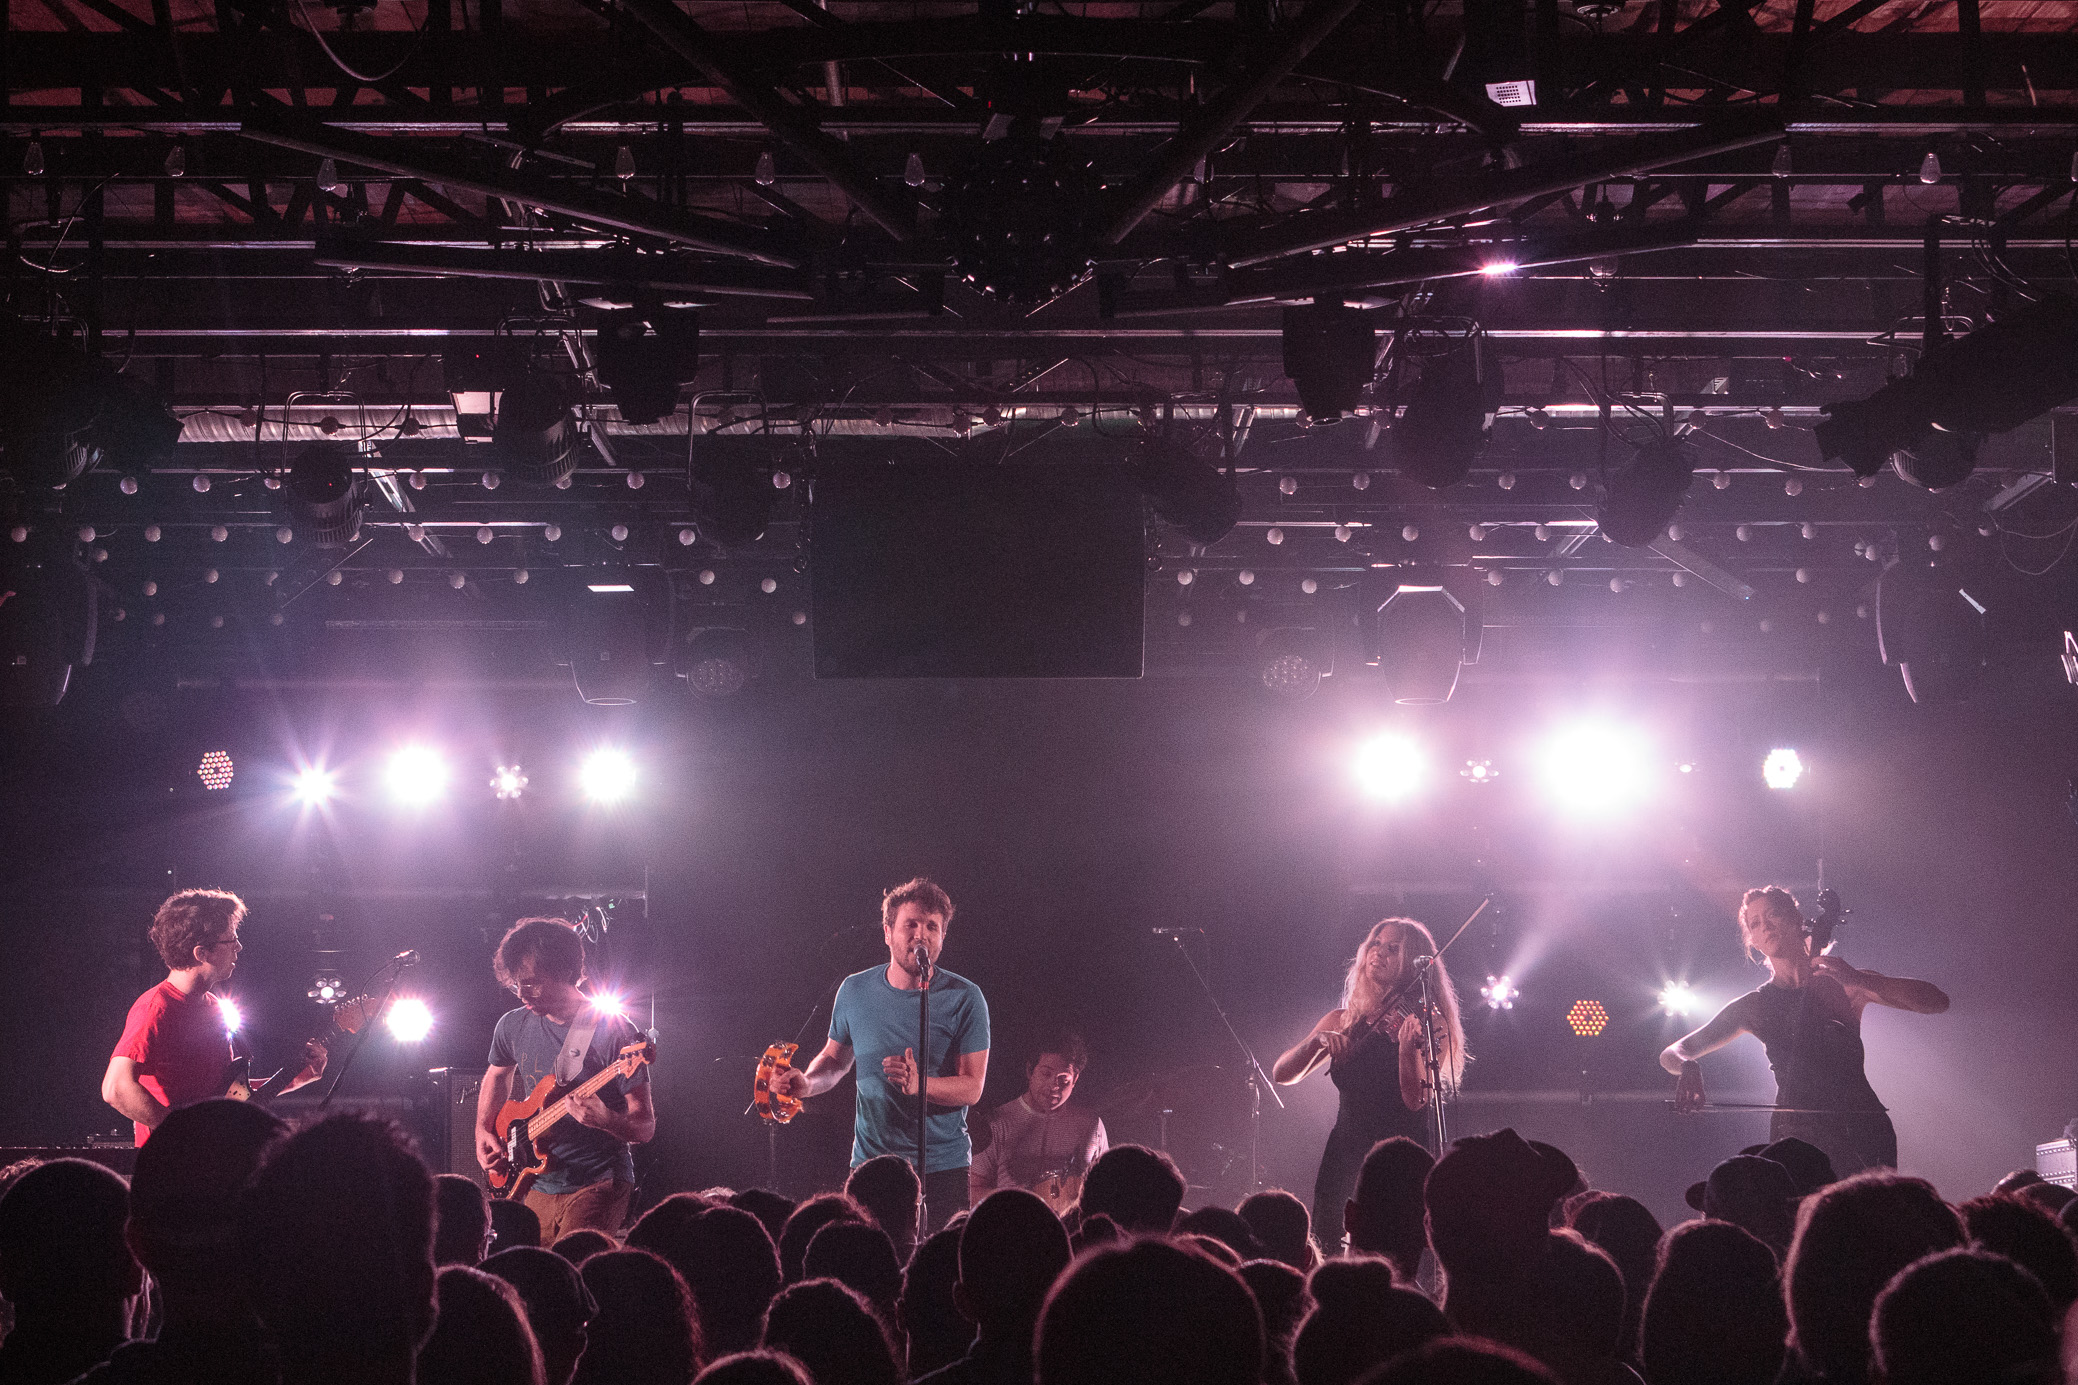 Ra Ra Riot performs at Saturn Birmingham in Birmingham, Alabama on March 12th, 2016.(Photo by David A. Smith/DSmithScenes)